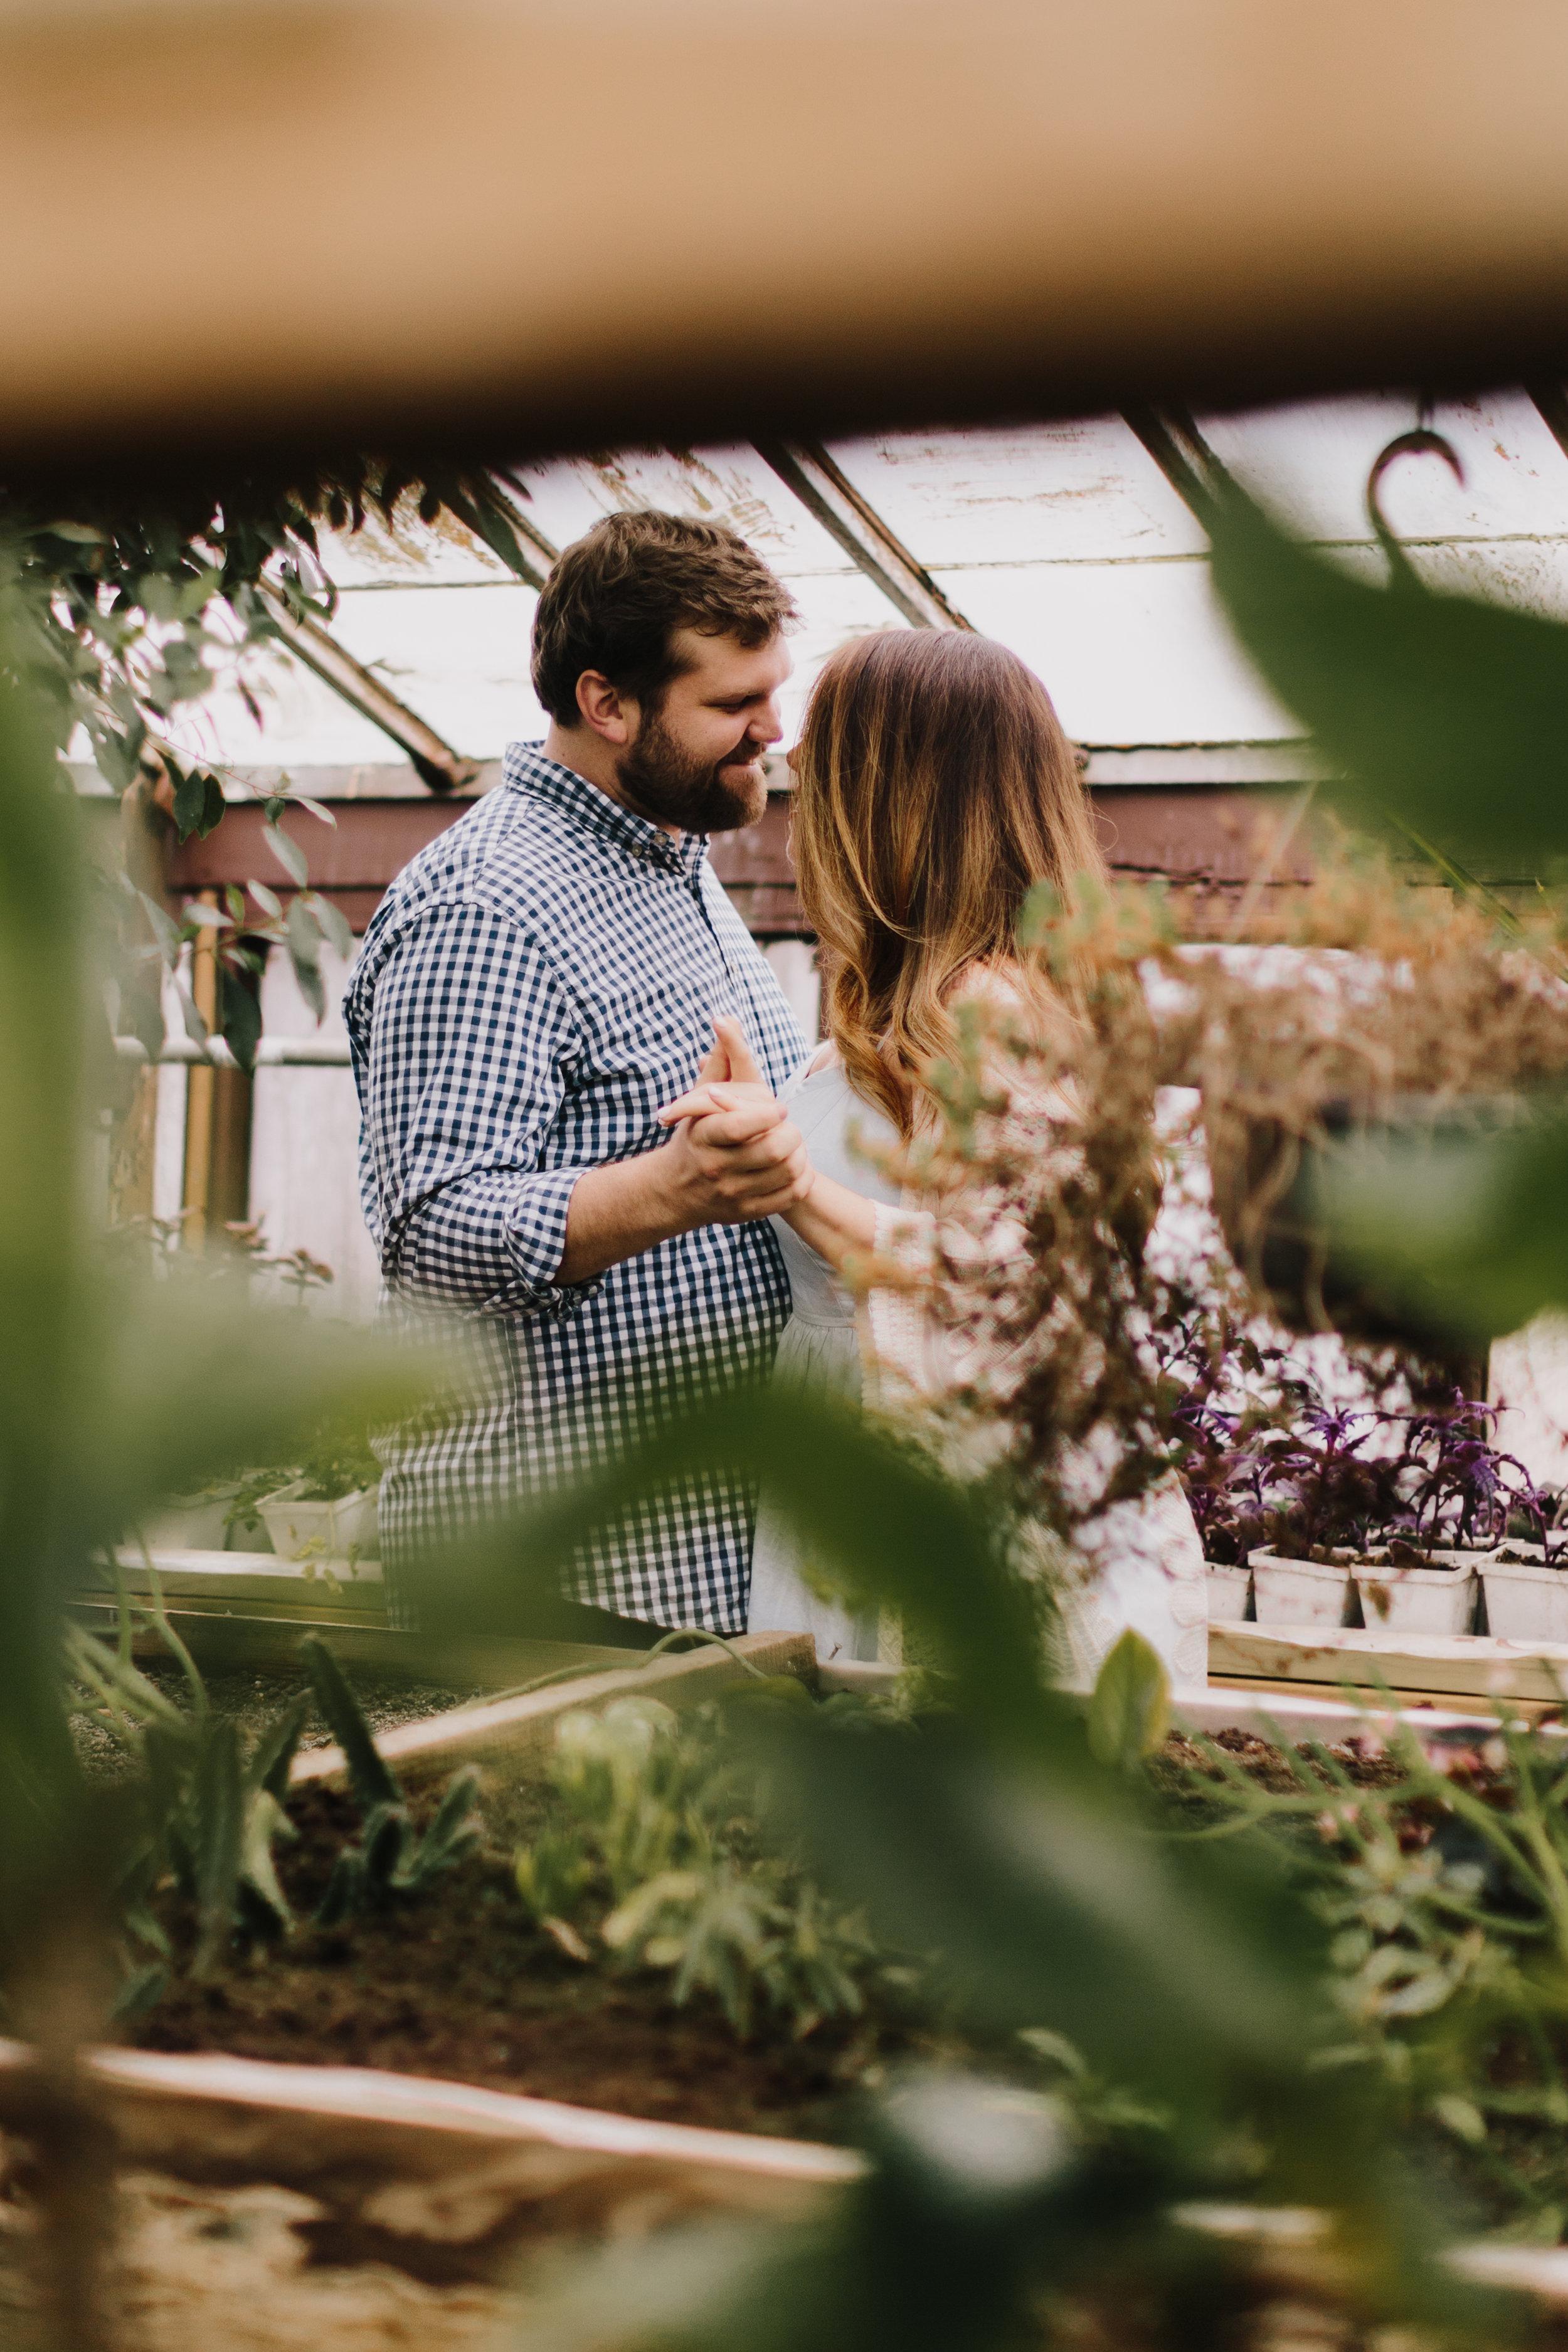 alyssa barletter photography greenhouse engagement photographer kansas city spring wedding-3.jpg